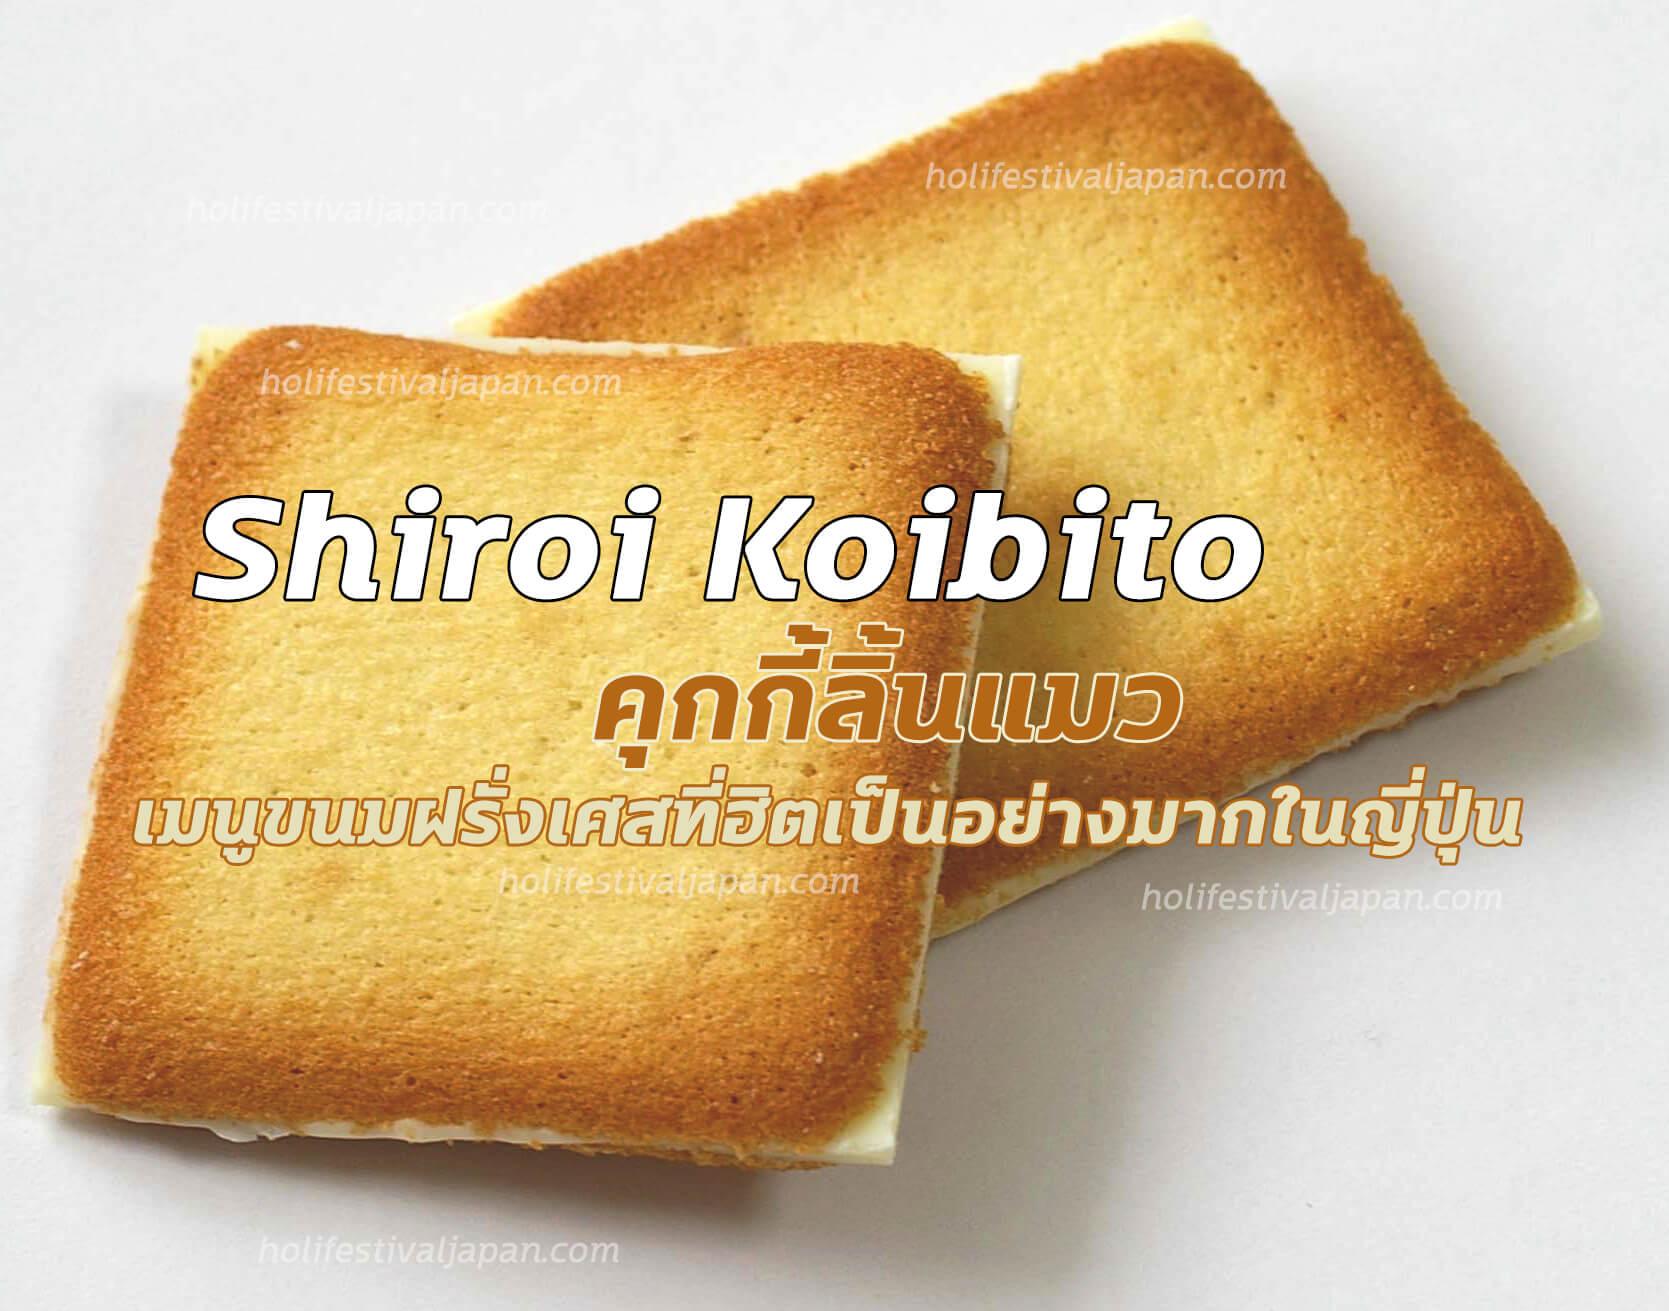 Shiroi Koibito คุกกี้ลิ้นแมว ขนมฝรั่งเศสเป็นที่ยอดฮิตเป็นอย่างมากในญี่ปุ่น